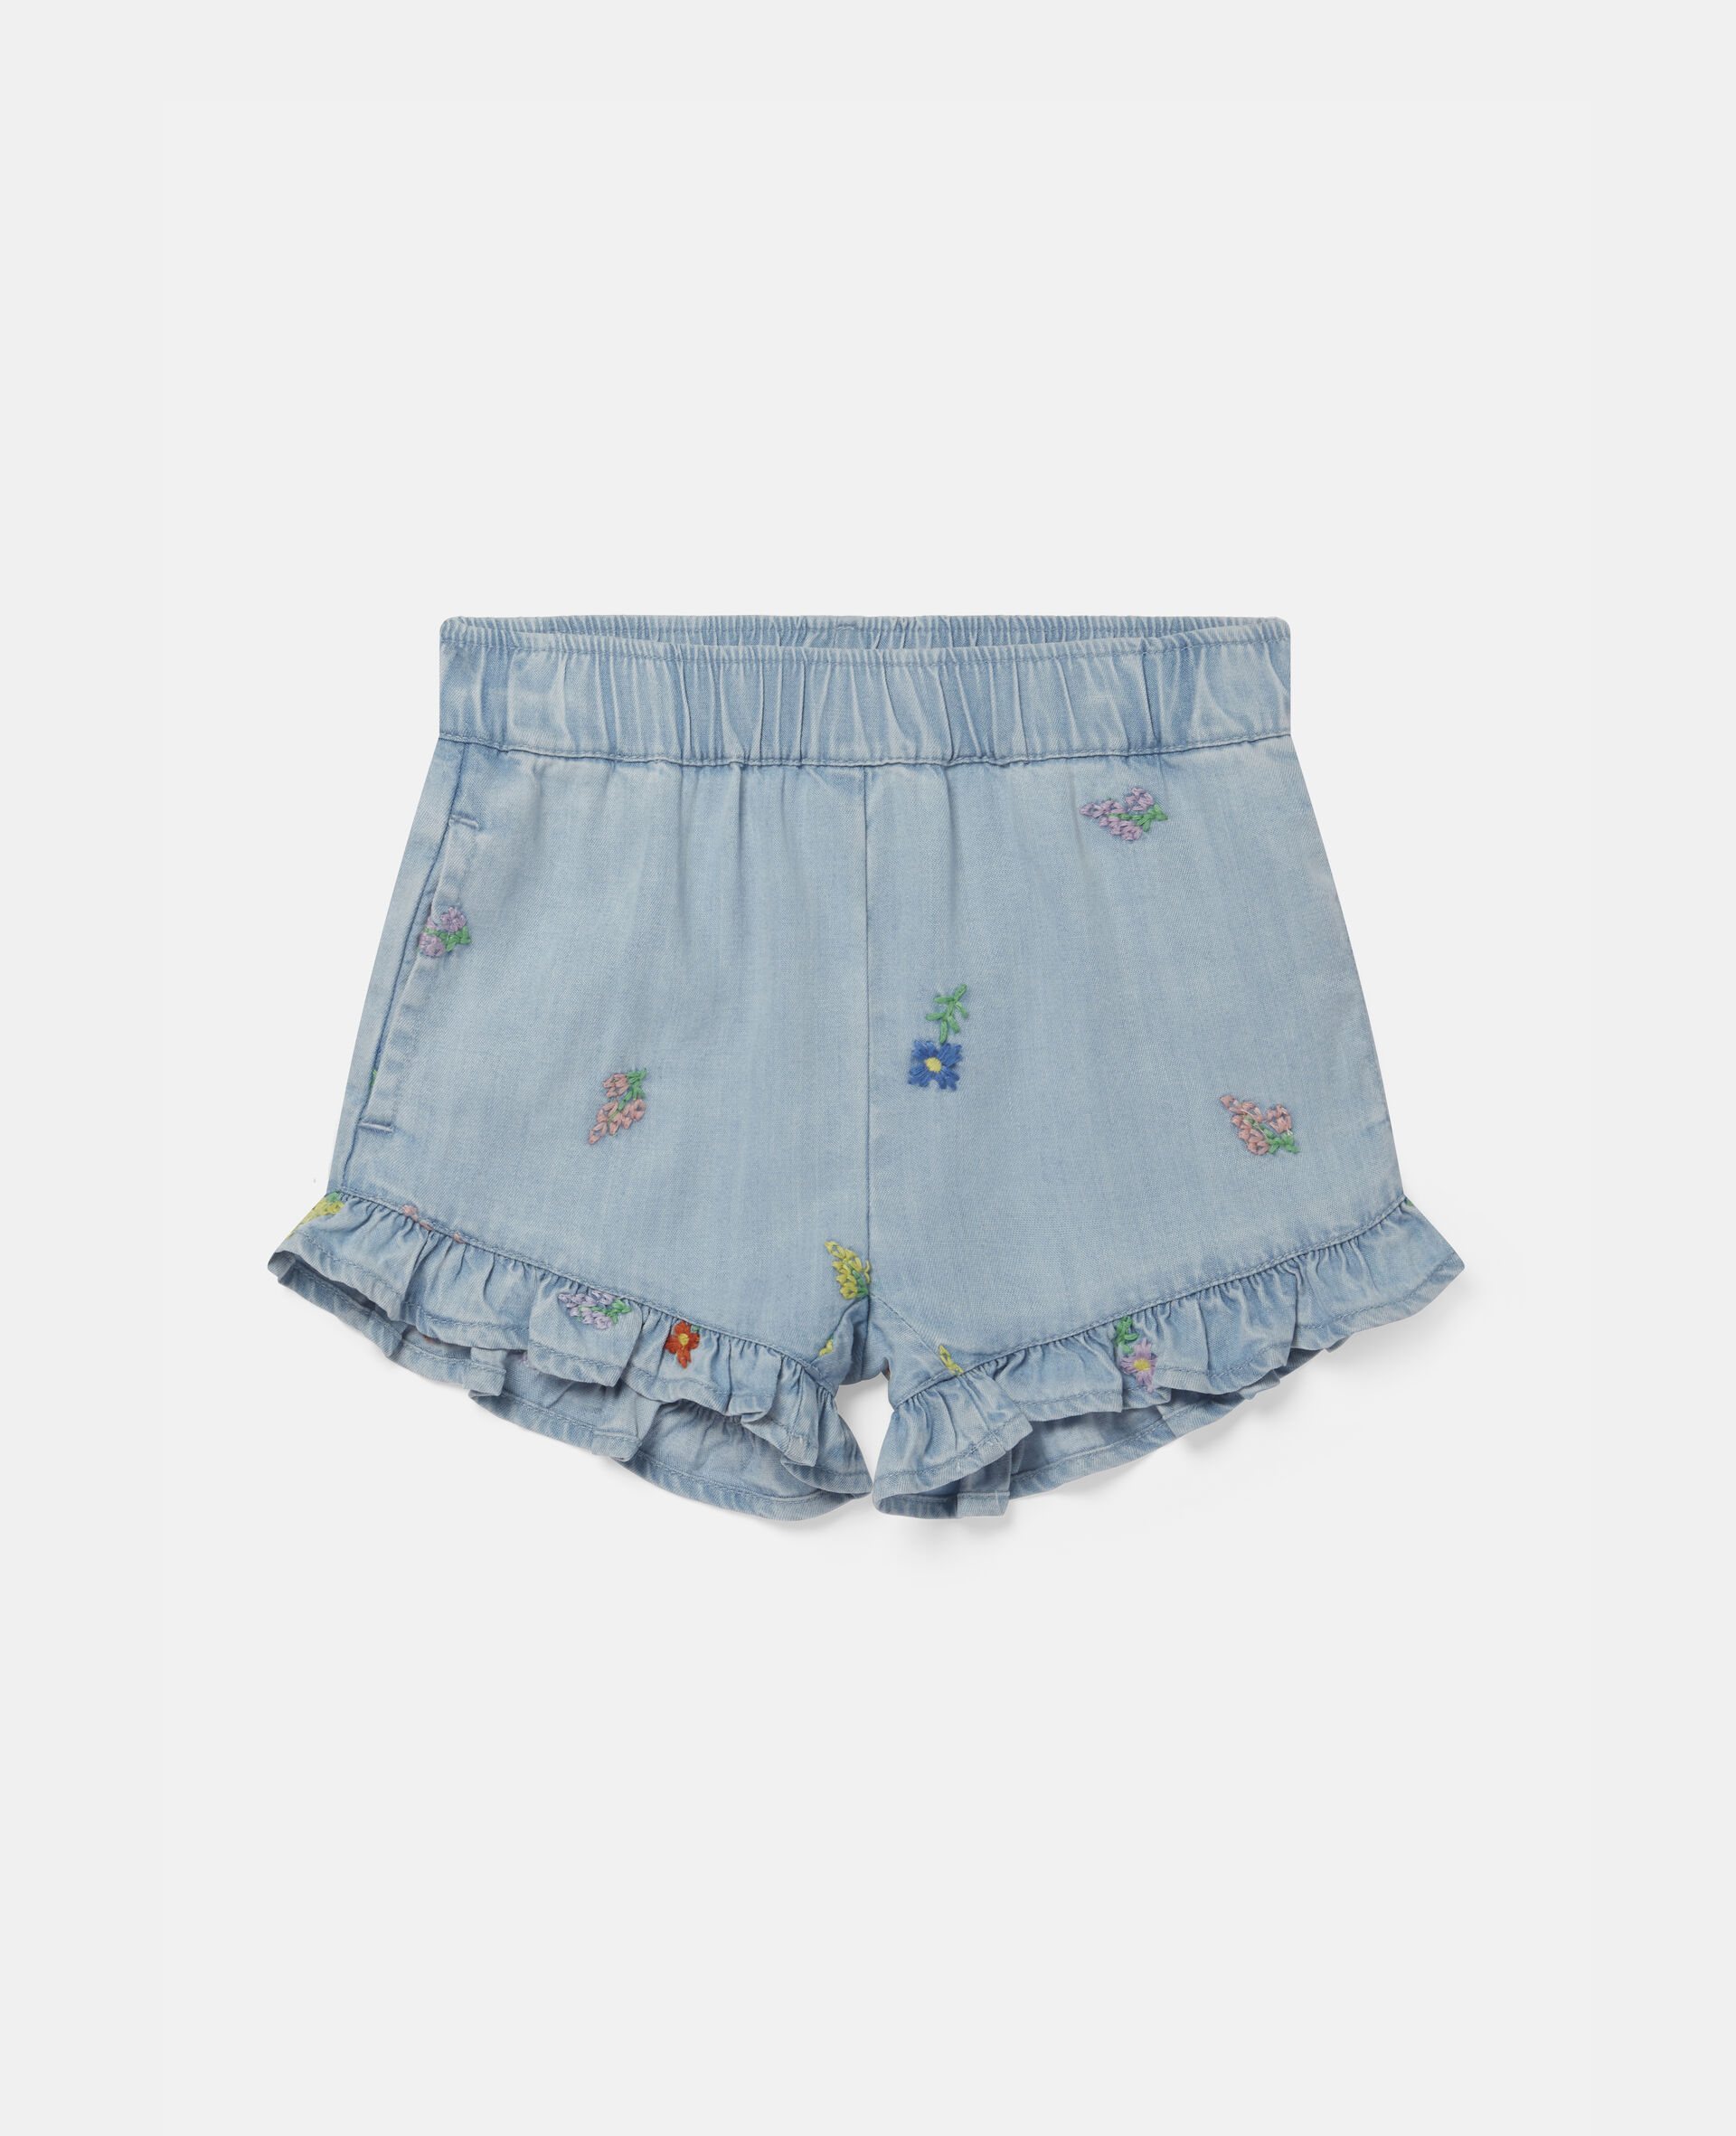 Embroidered Flowers Denim Shorts-Blue-large image number 0